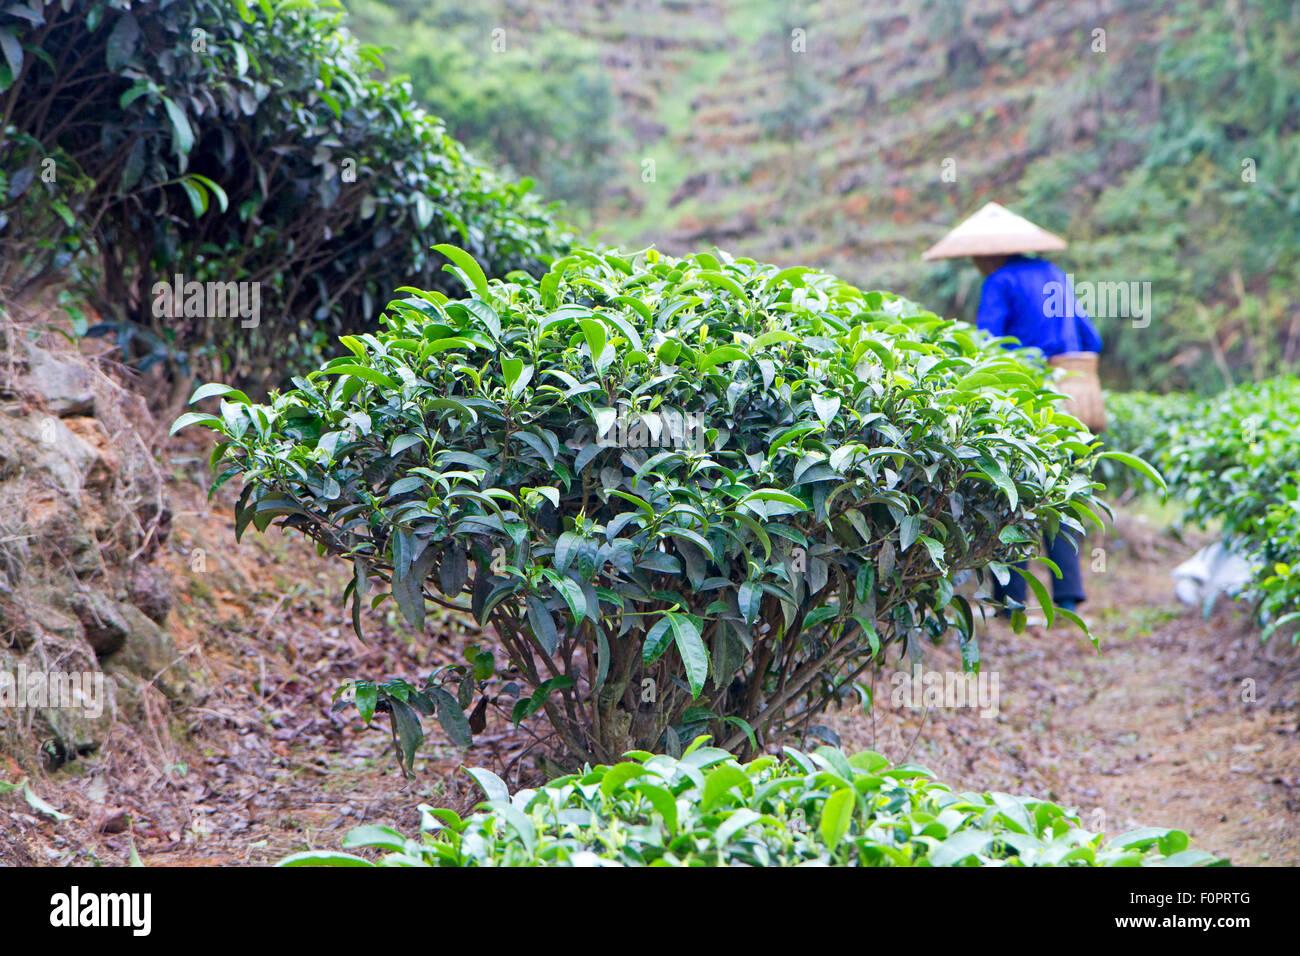 Tea picker in China's Guizhou province Stock Photo